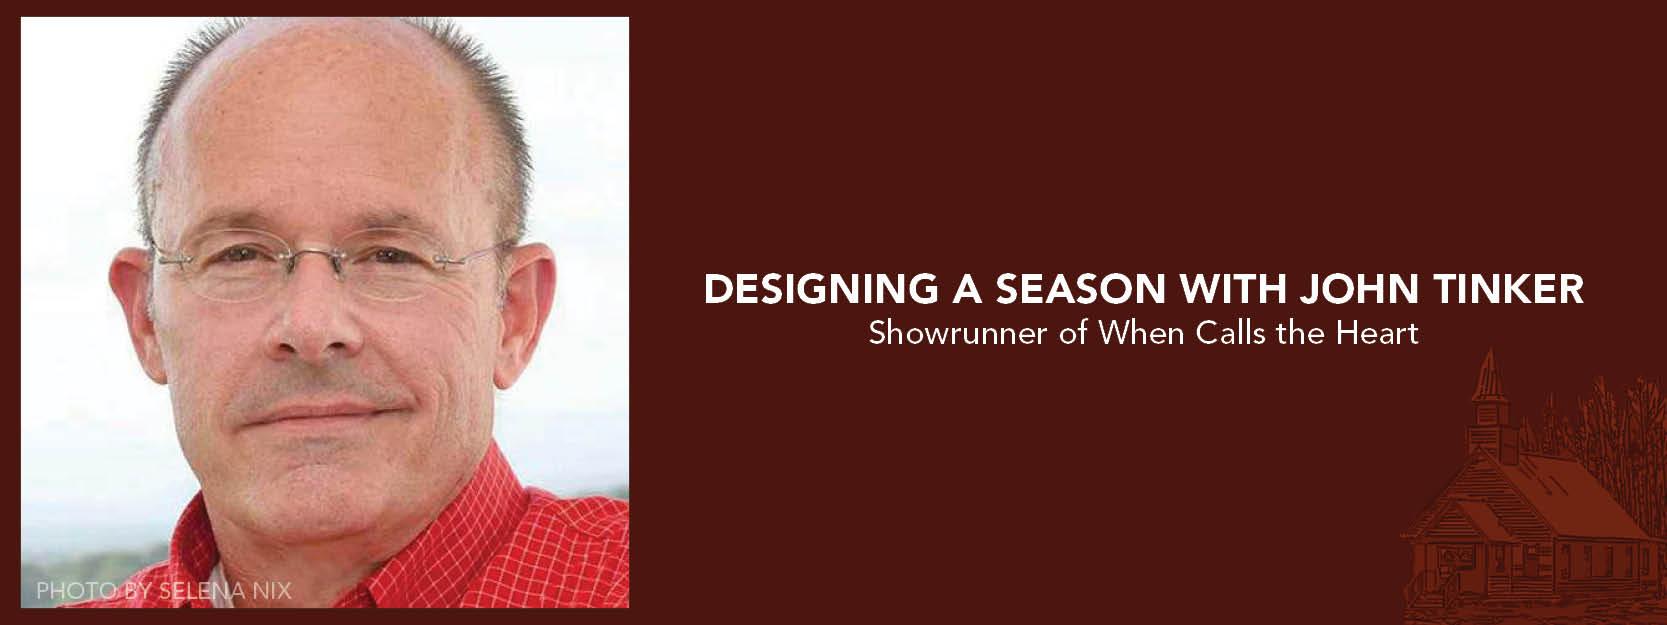 Designing a Season with John Tinker